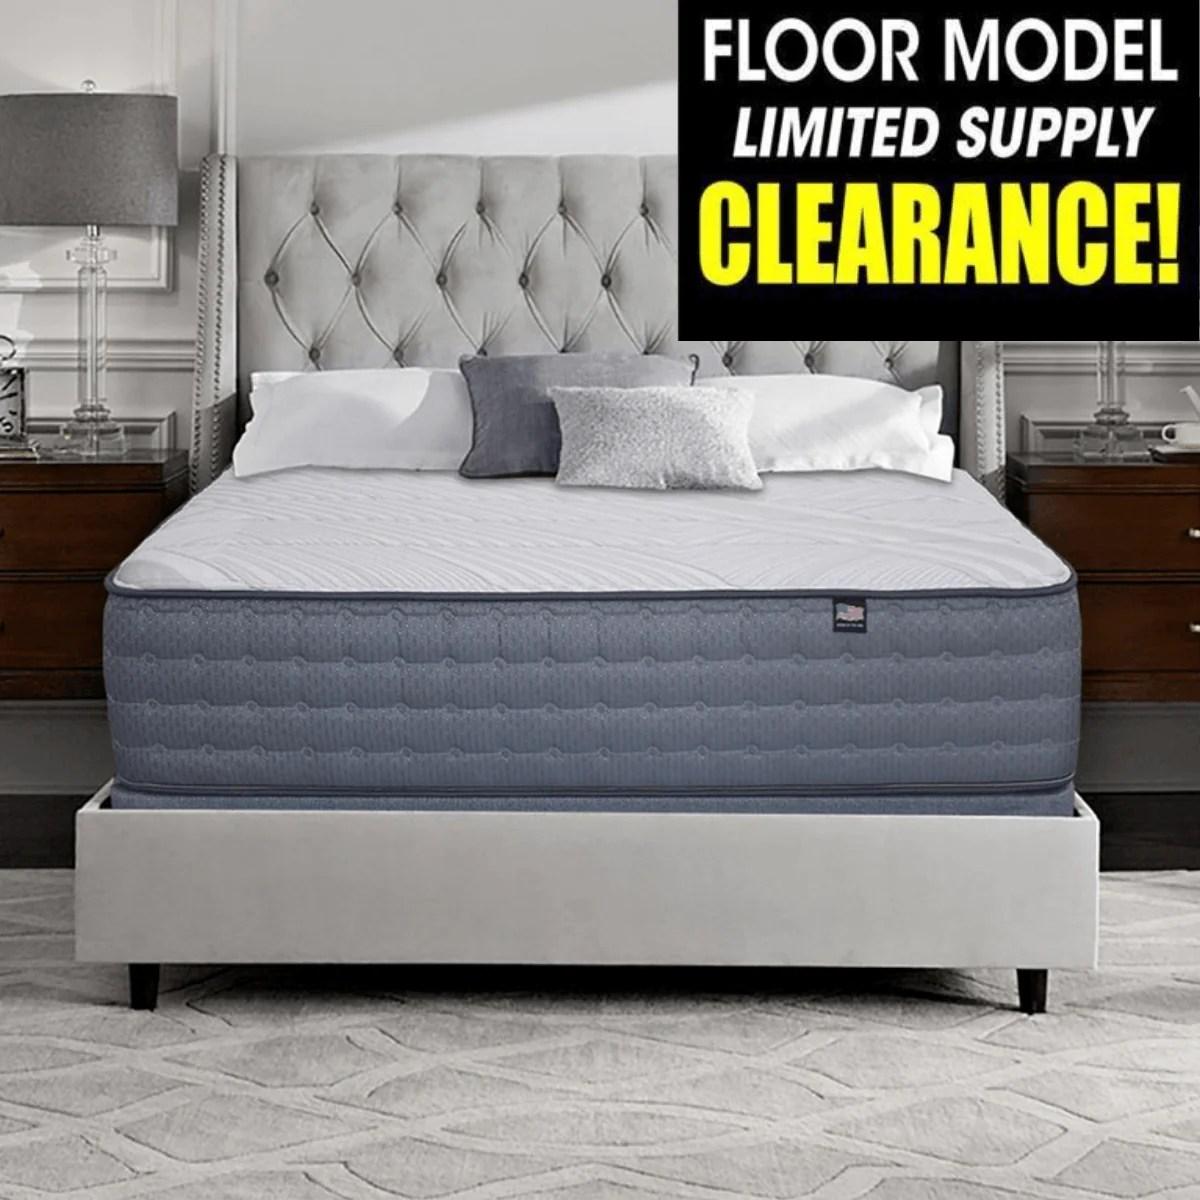 therapedic sedona plush floor sample clearance